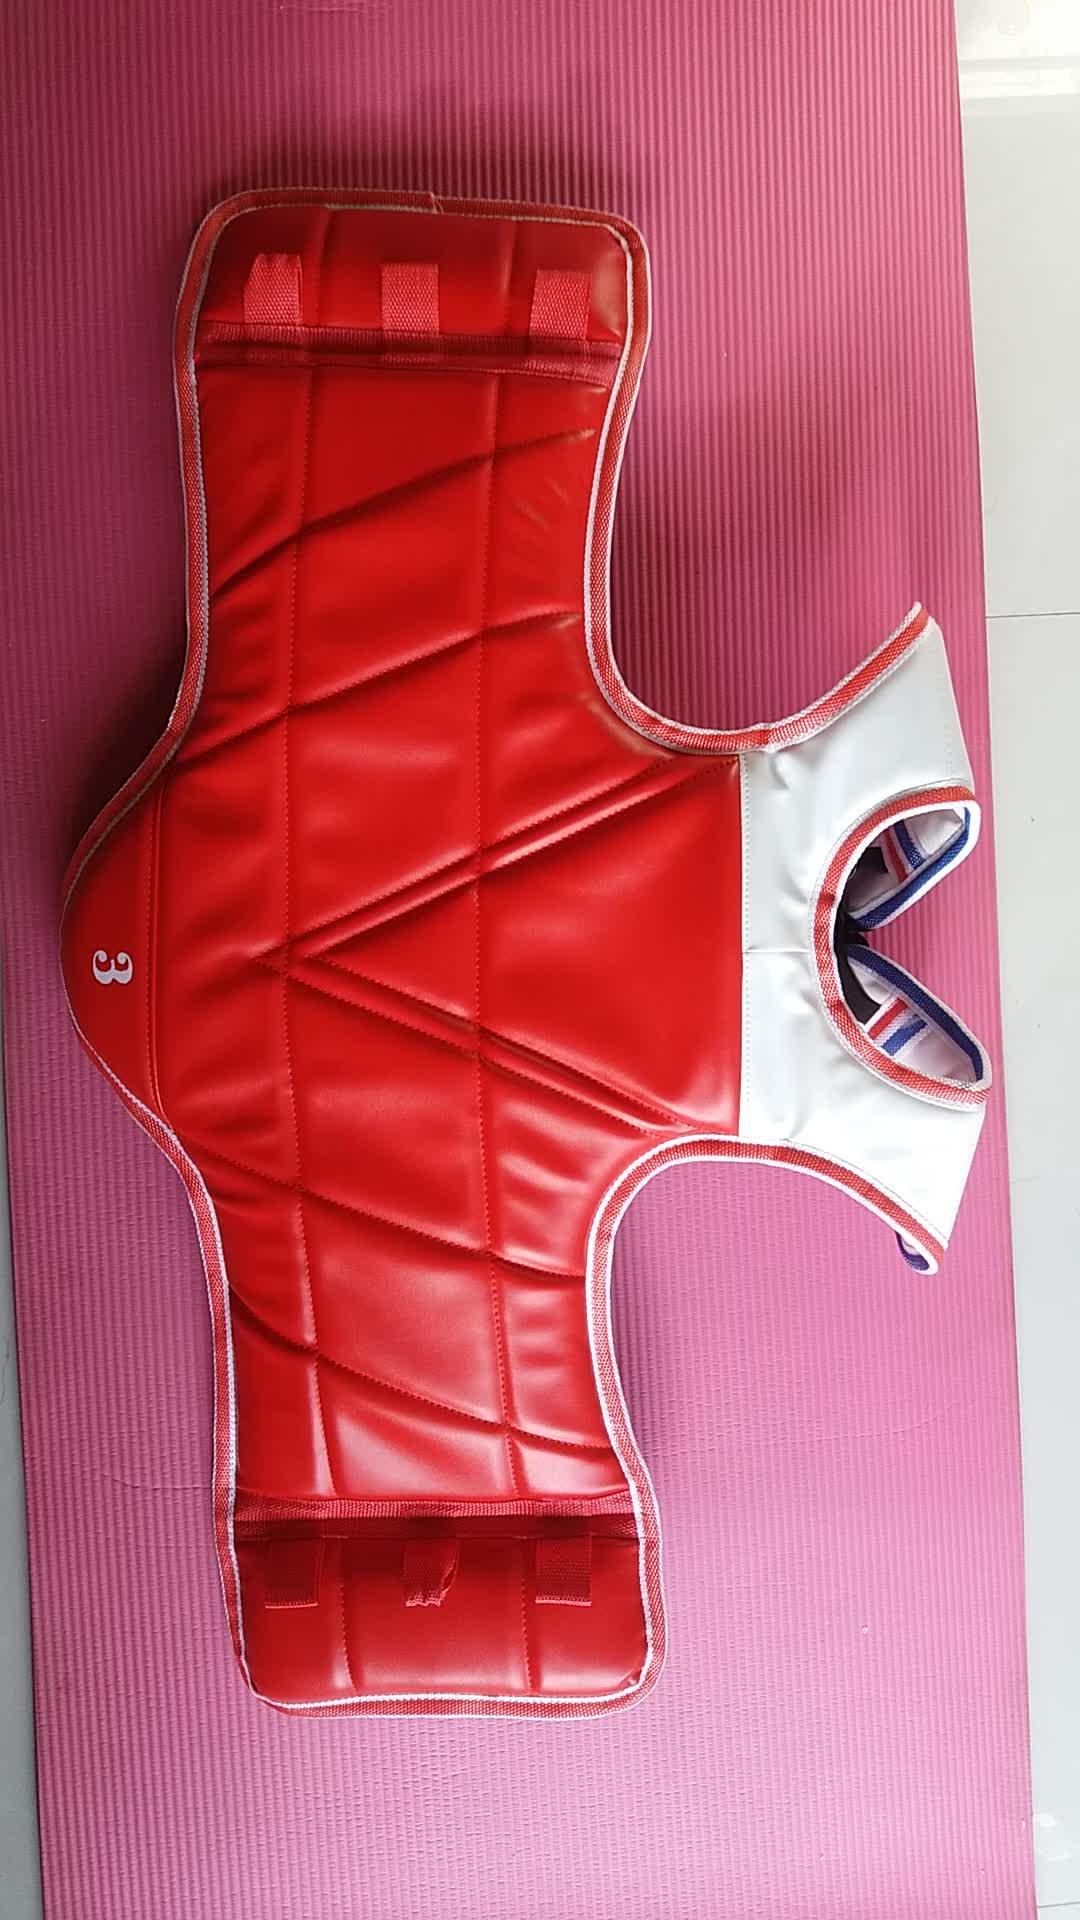 Großhandel Brustschutz für Taekwondo Body Guard Body Protector